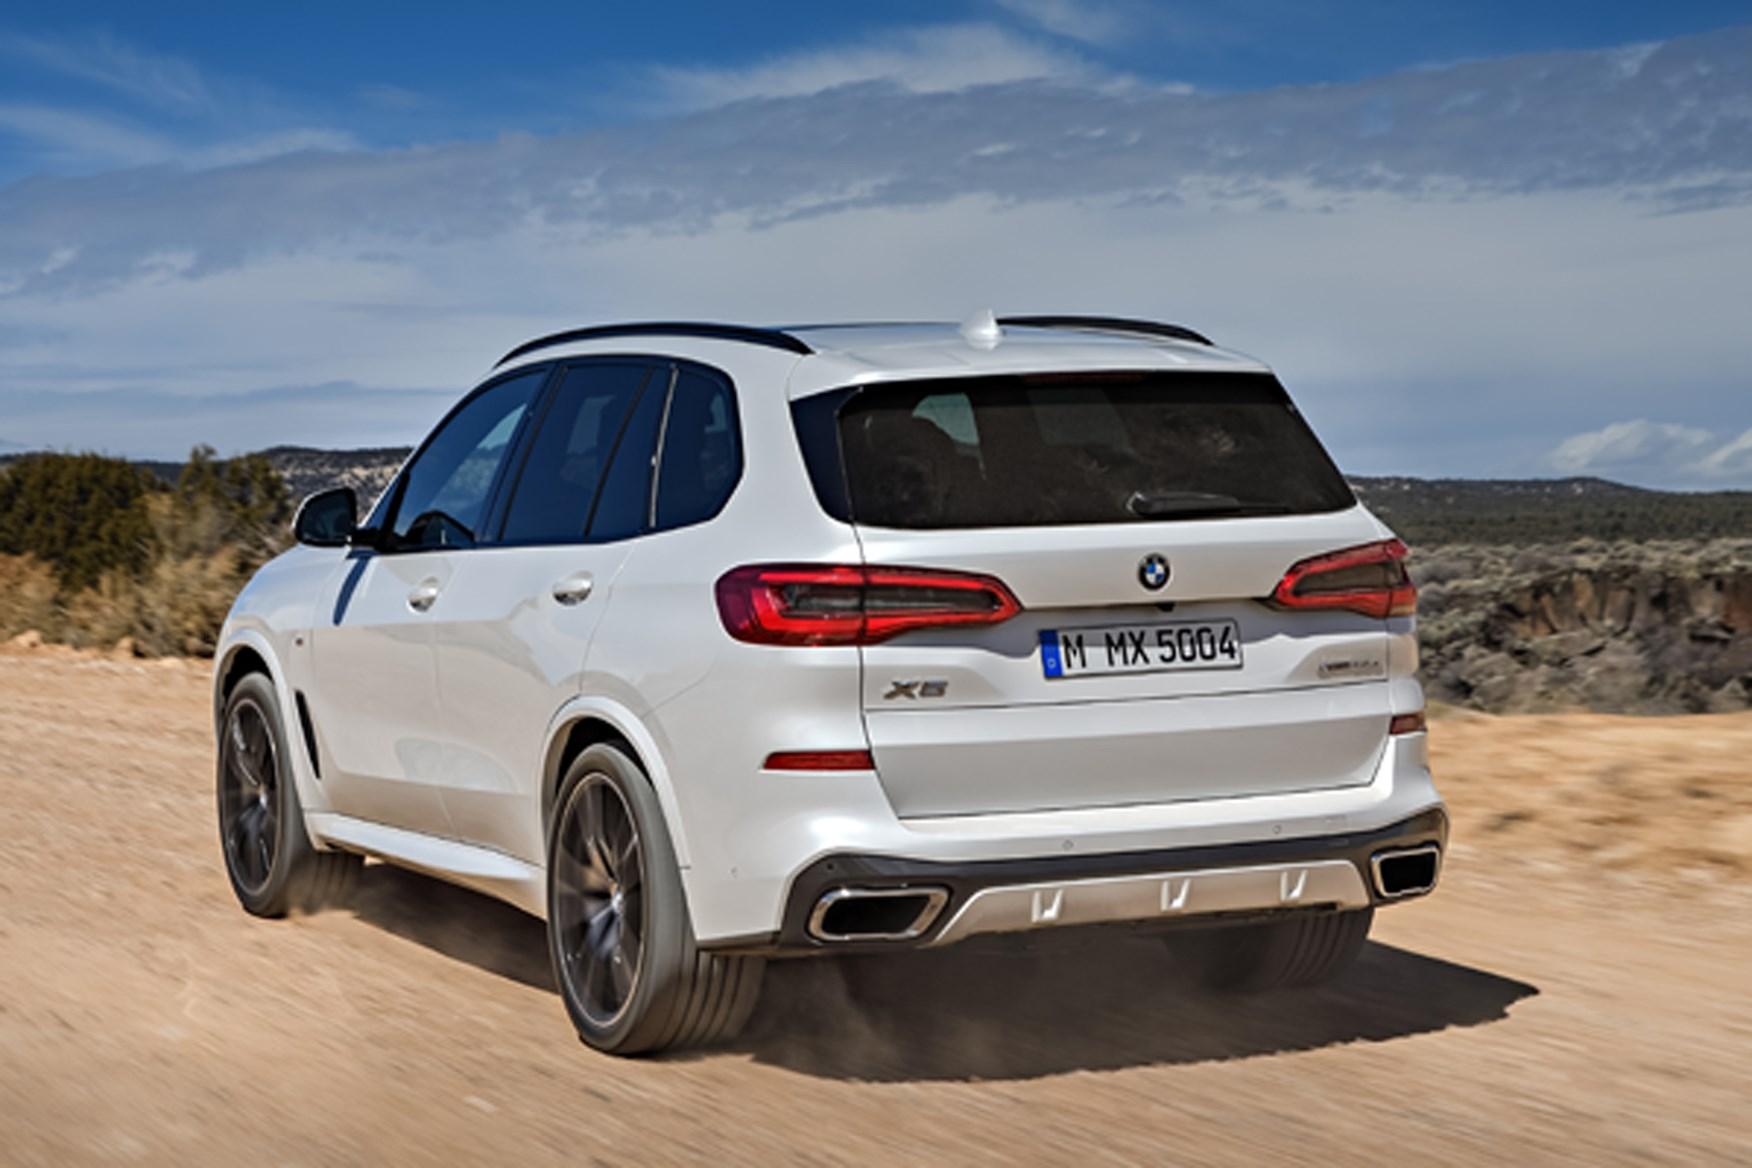 BMW X5 2018 rear driving shot